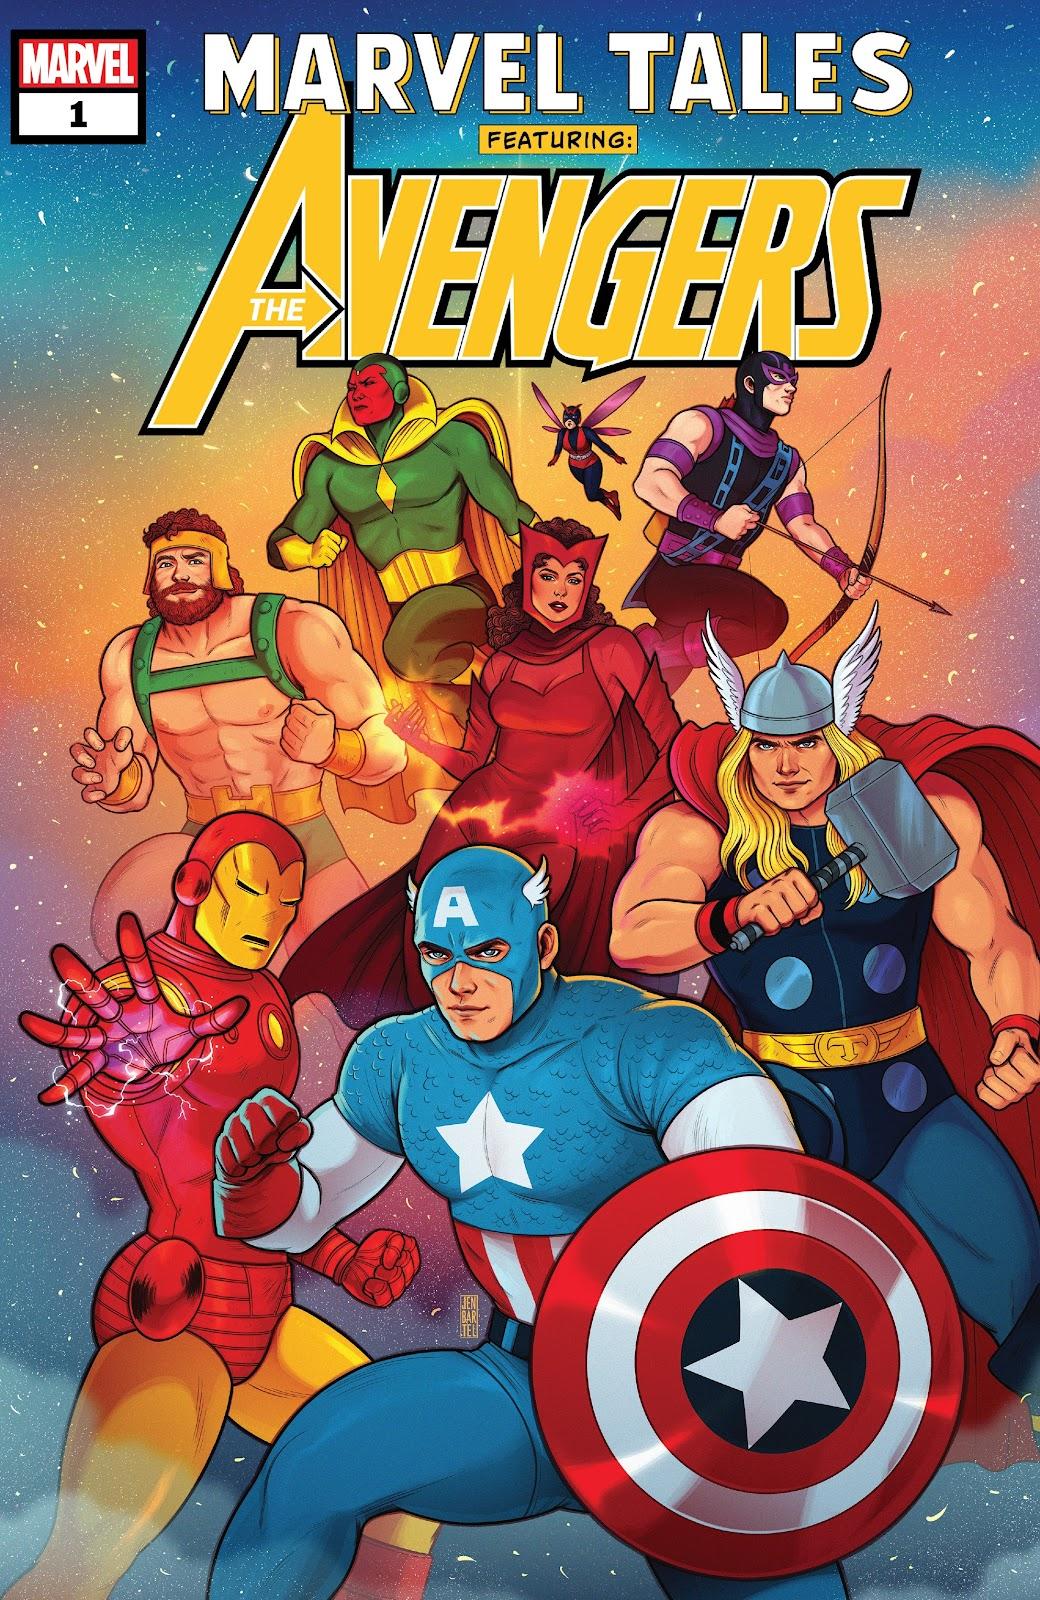 Read online Marvel Tales: Avengers comic -  Issue # Full - 1